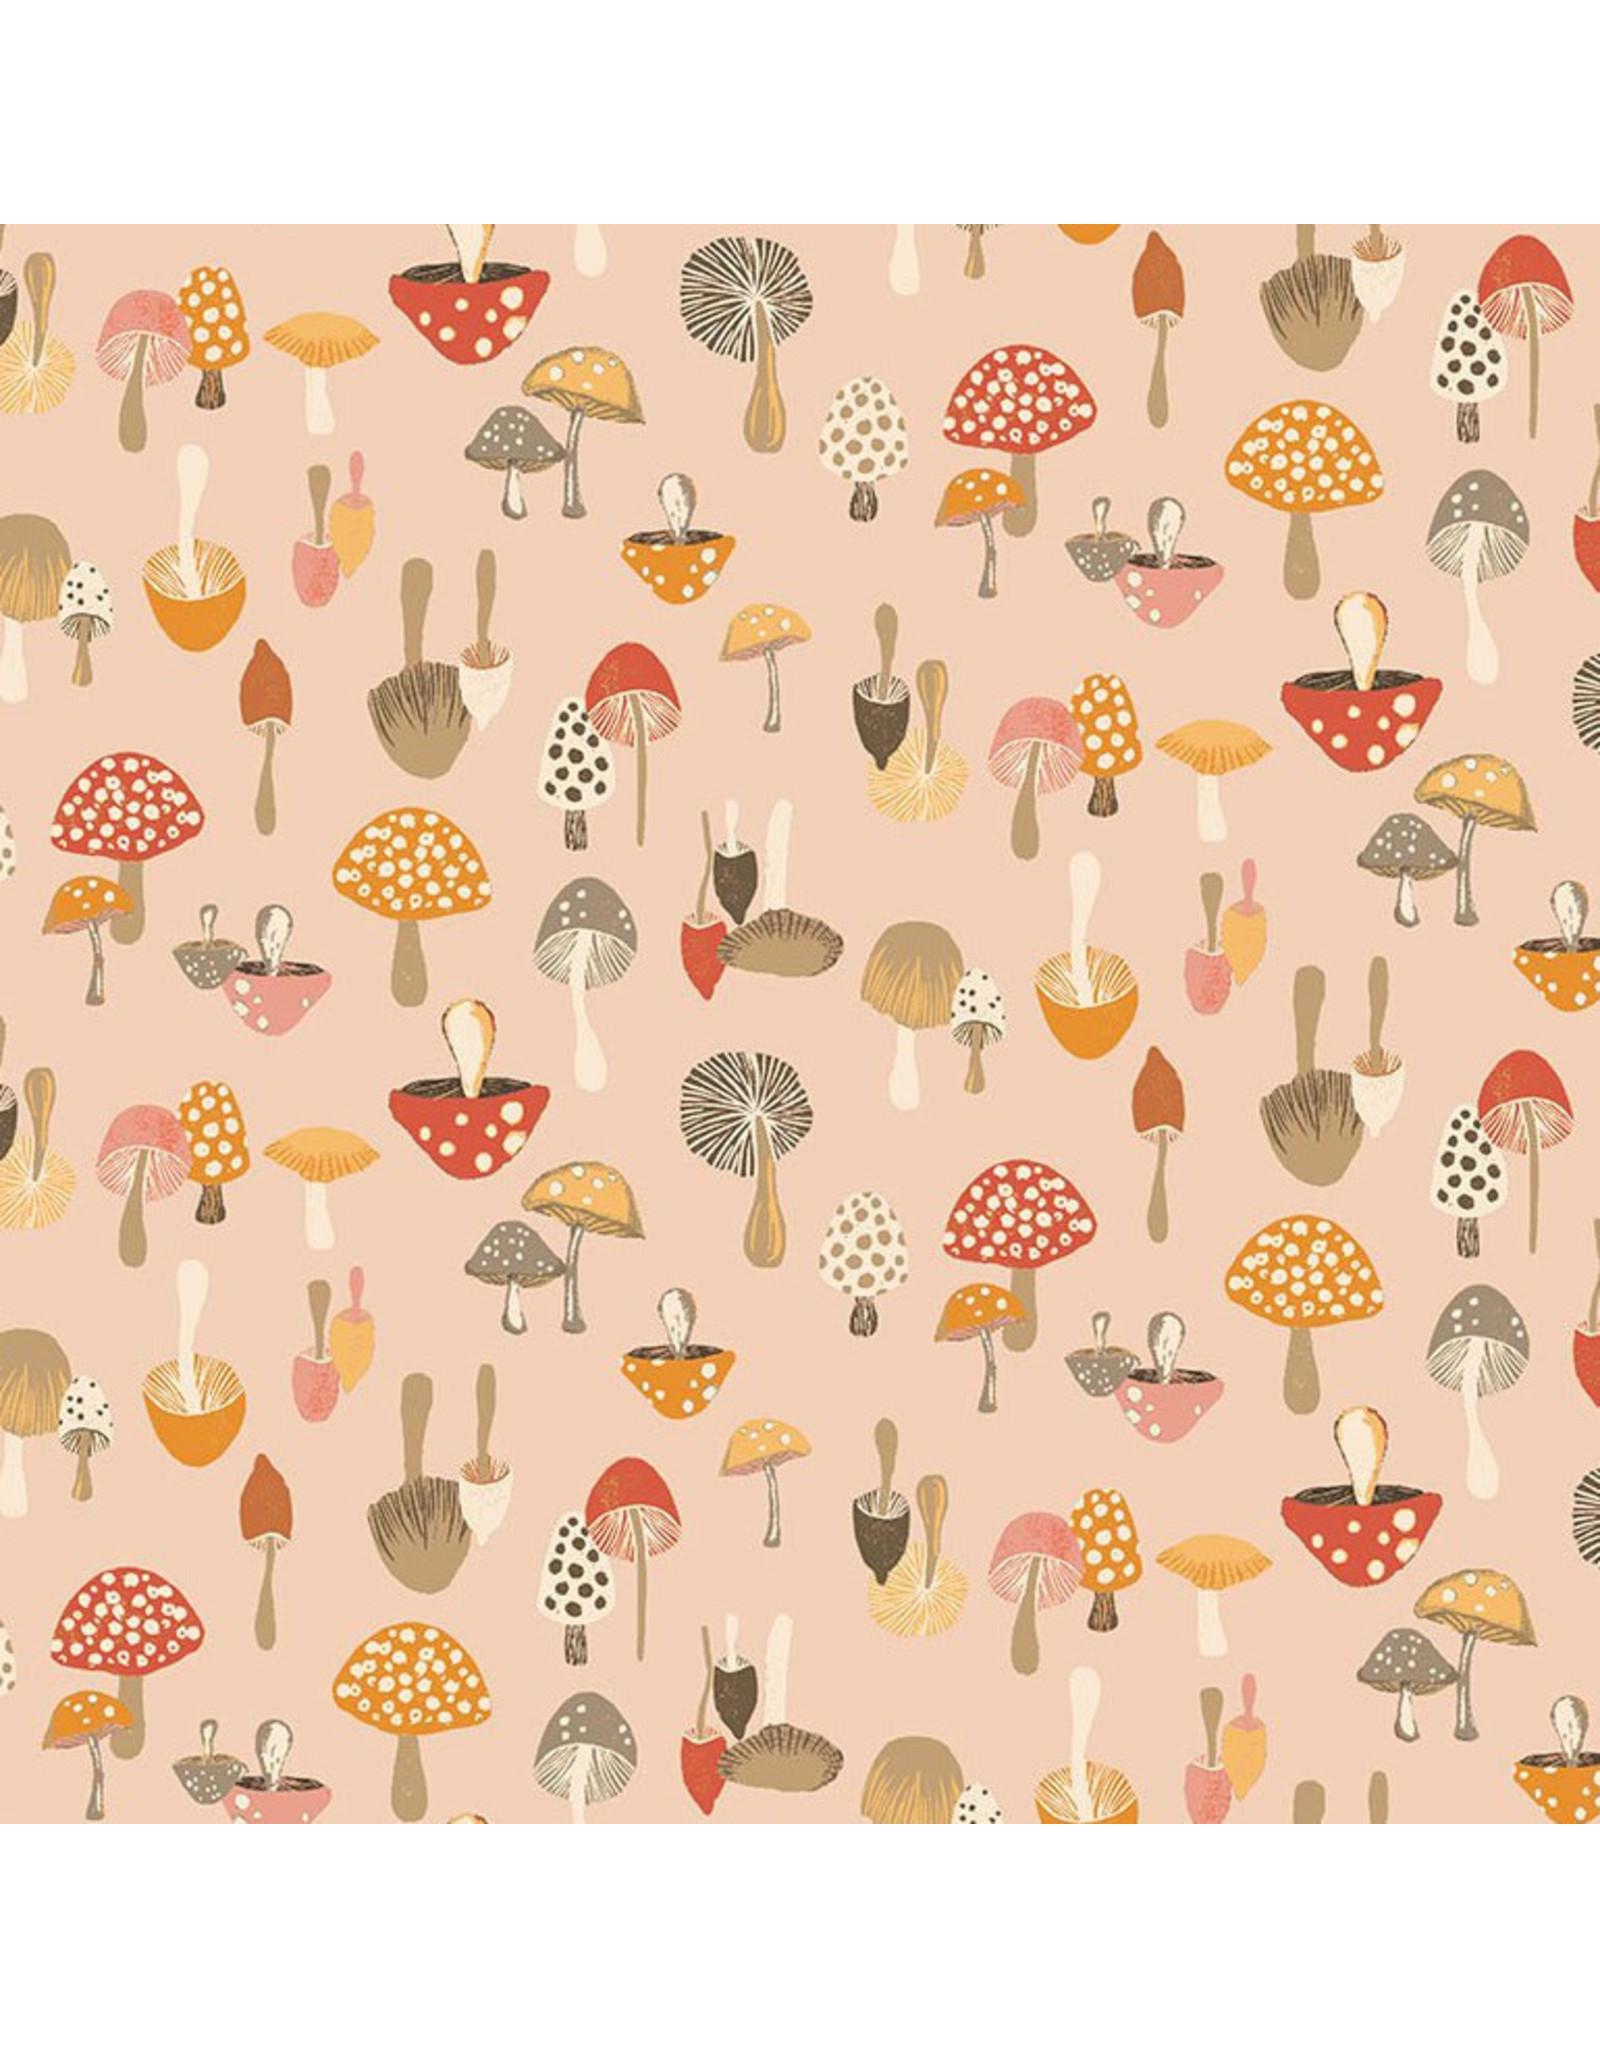 Dear Stella Frond of You, Don't Give a Shitake in Creampuff, Fabric Half-Yards